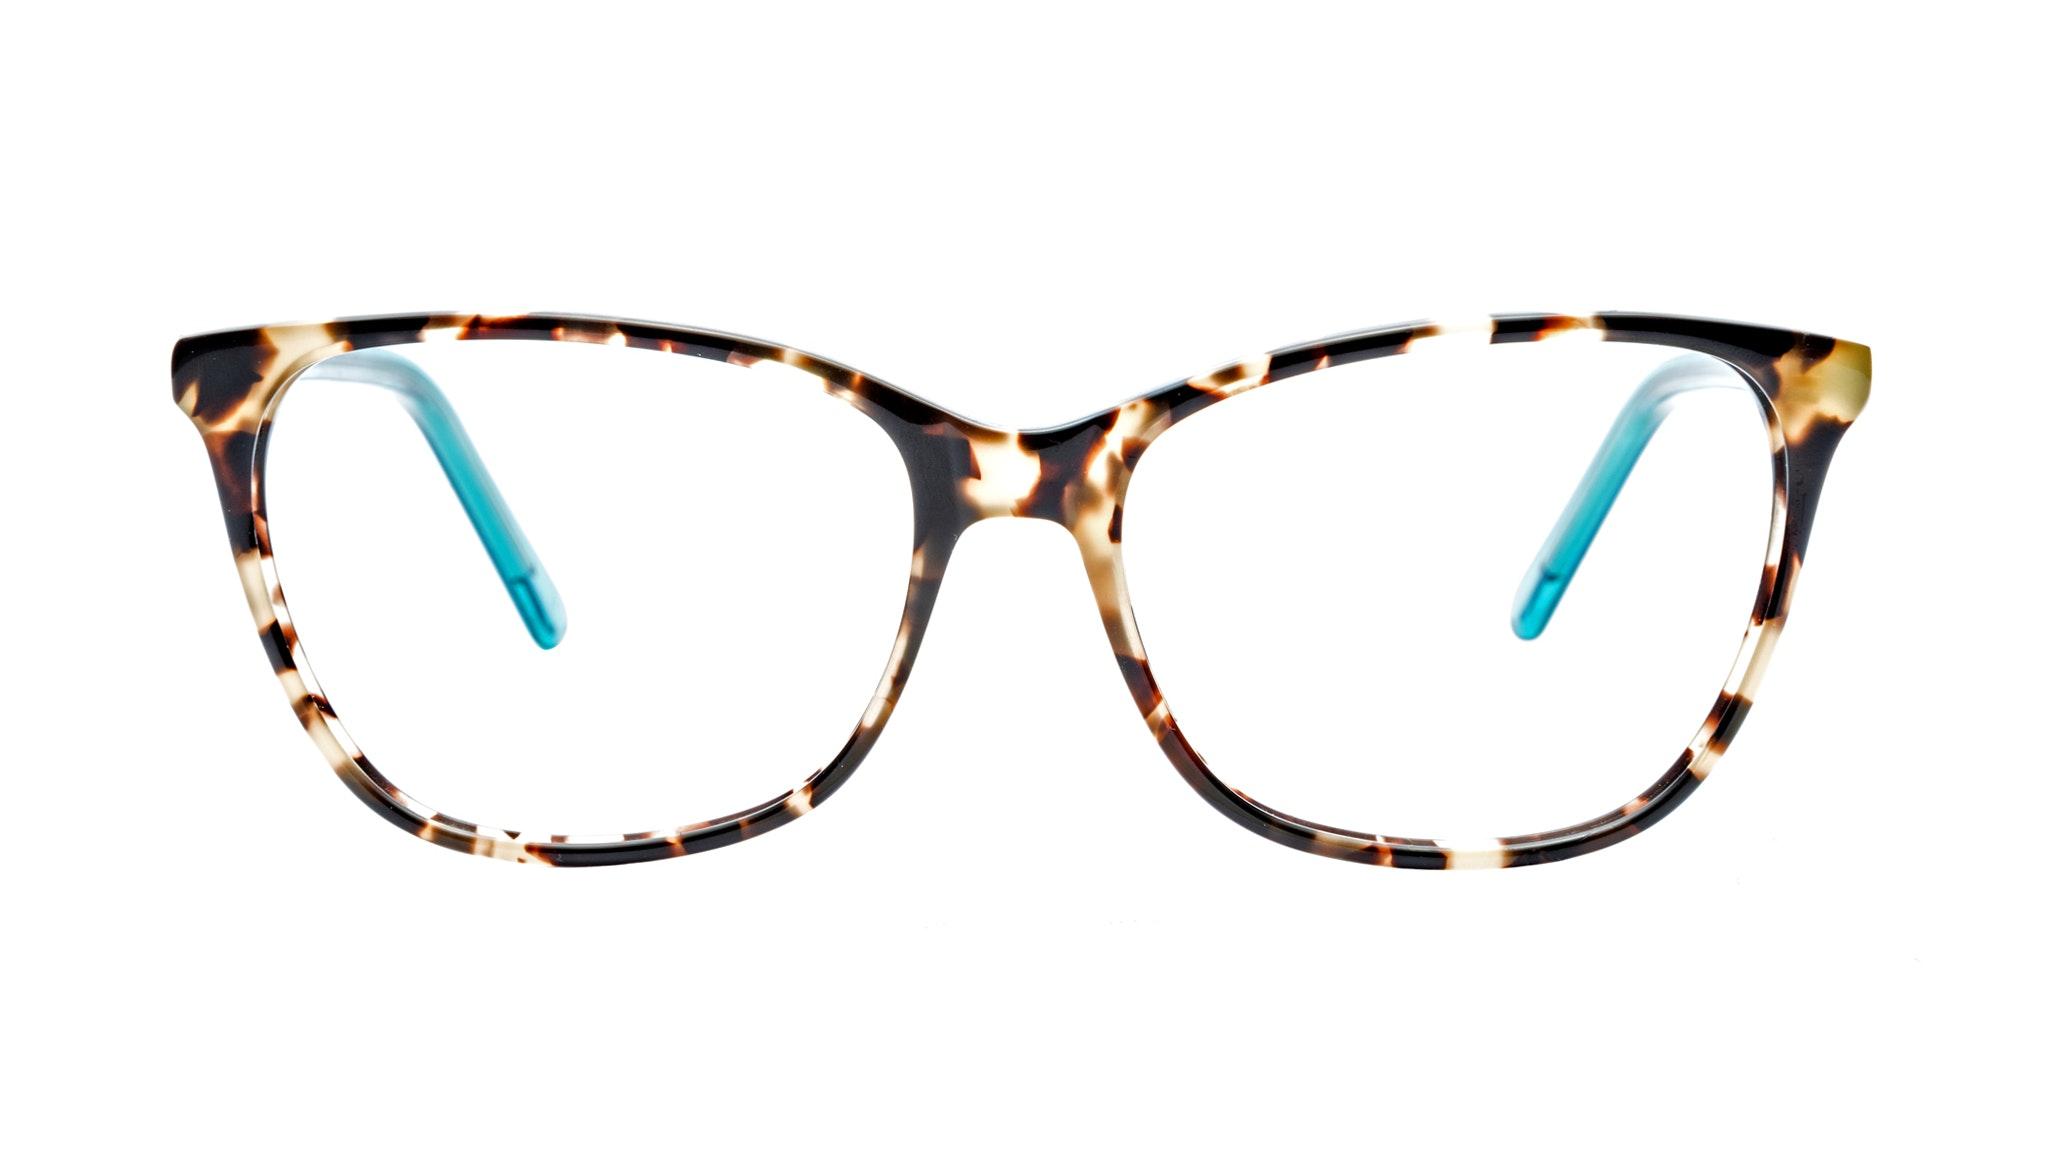 Affordable Fashion Glasses Cat Eye Eyeglasses Women Flair Teal Tort Front